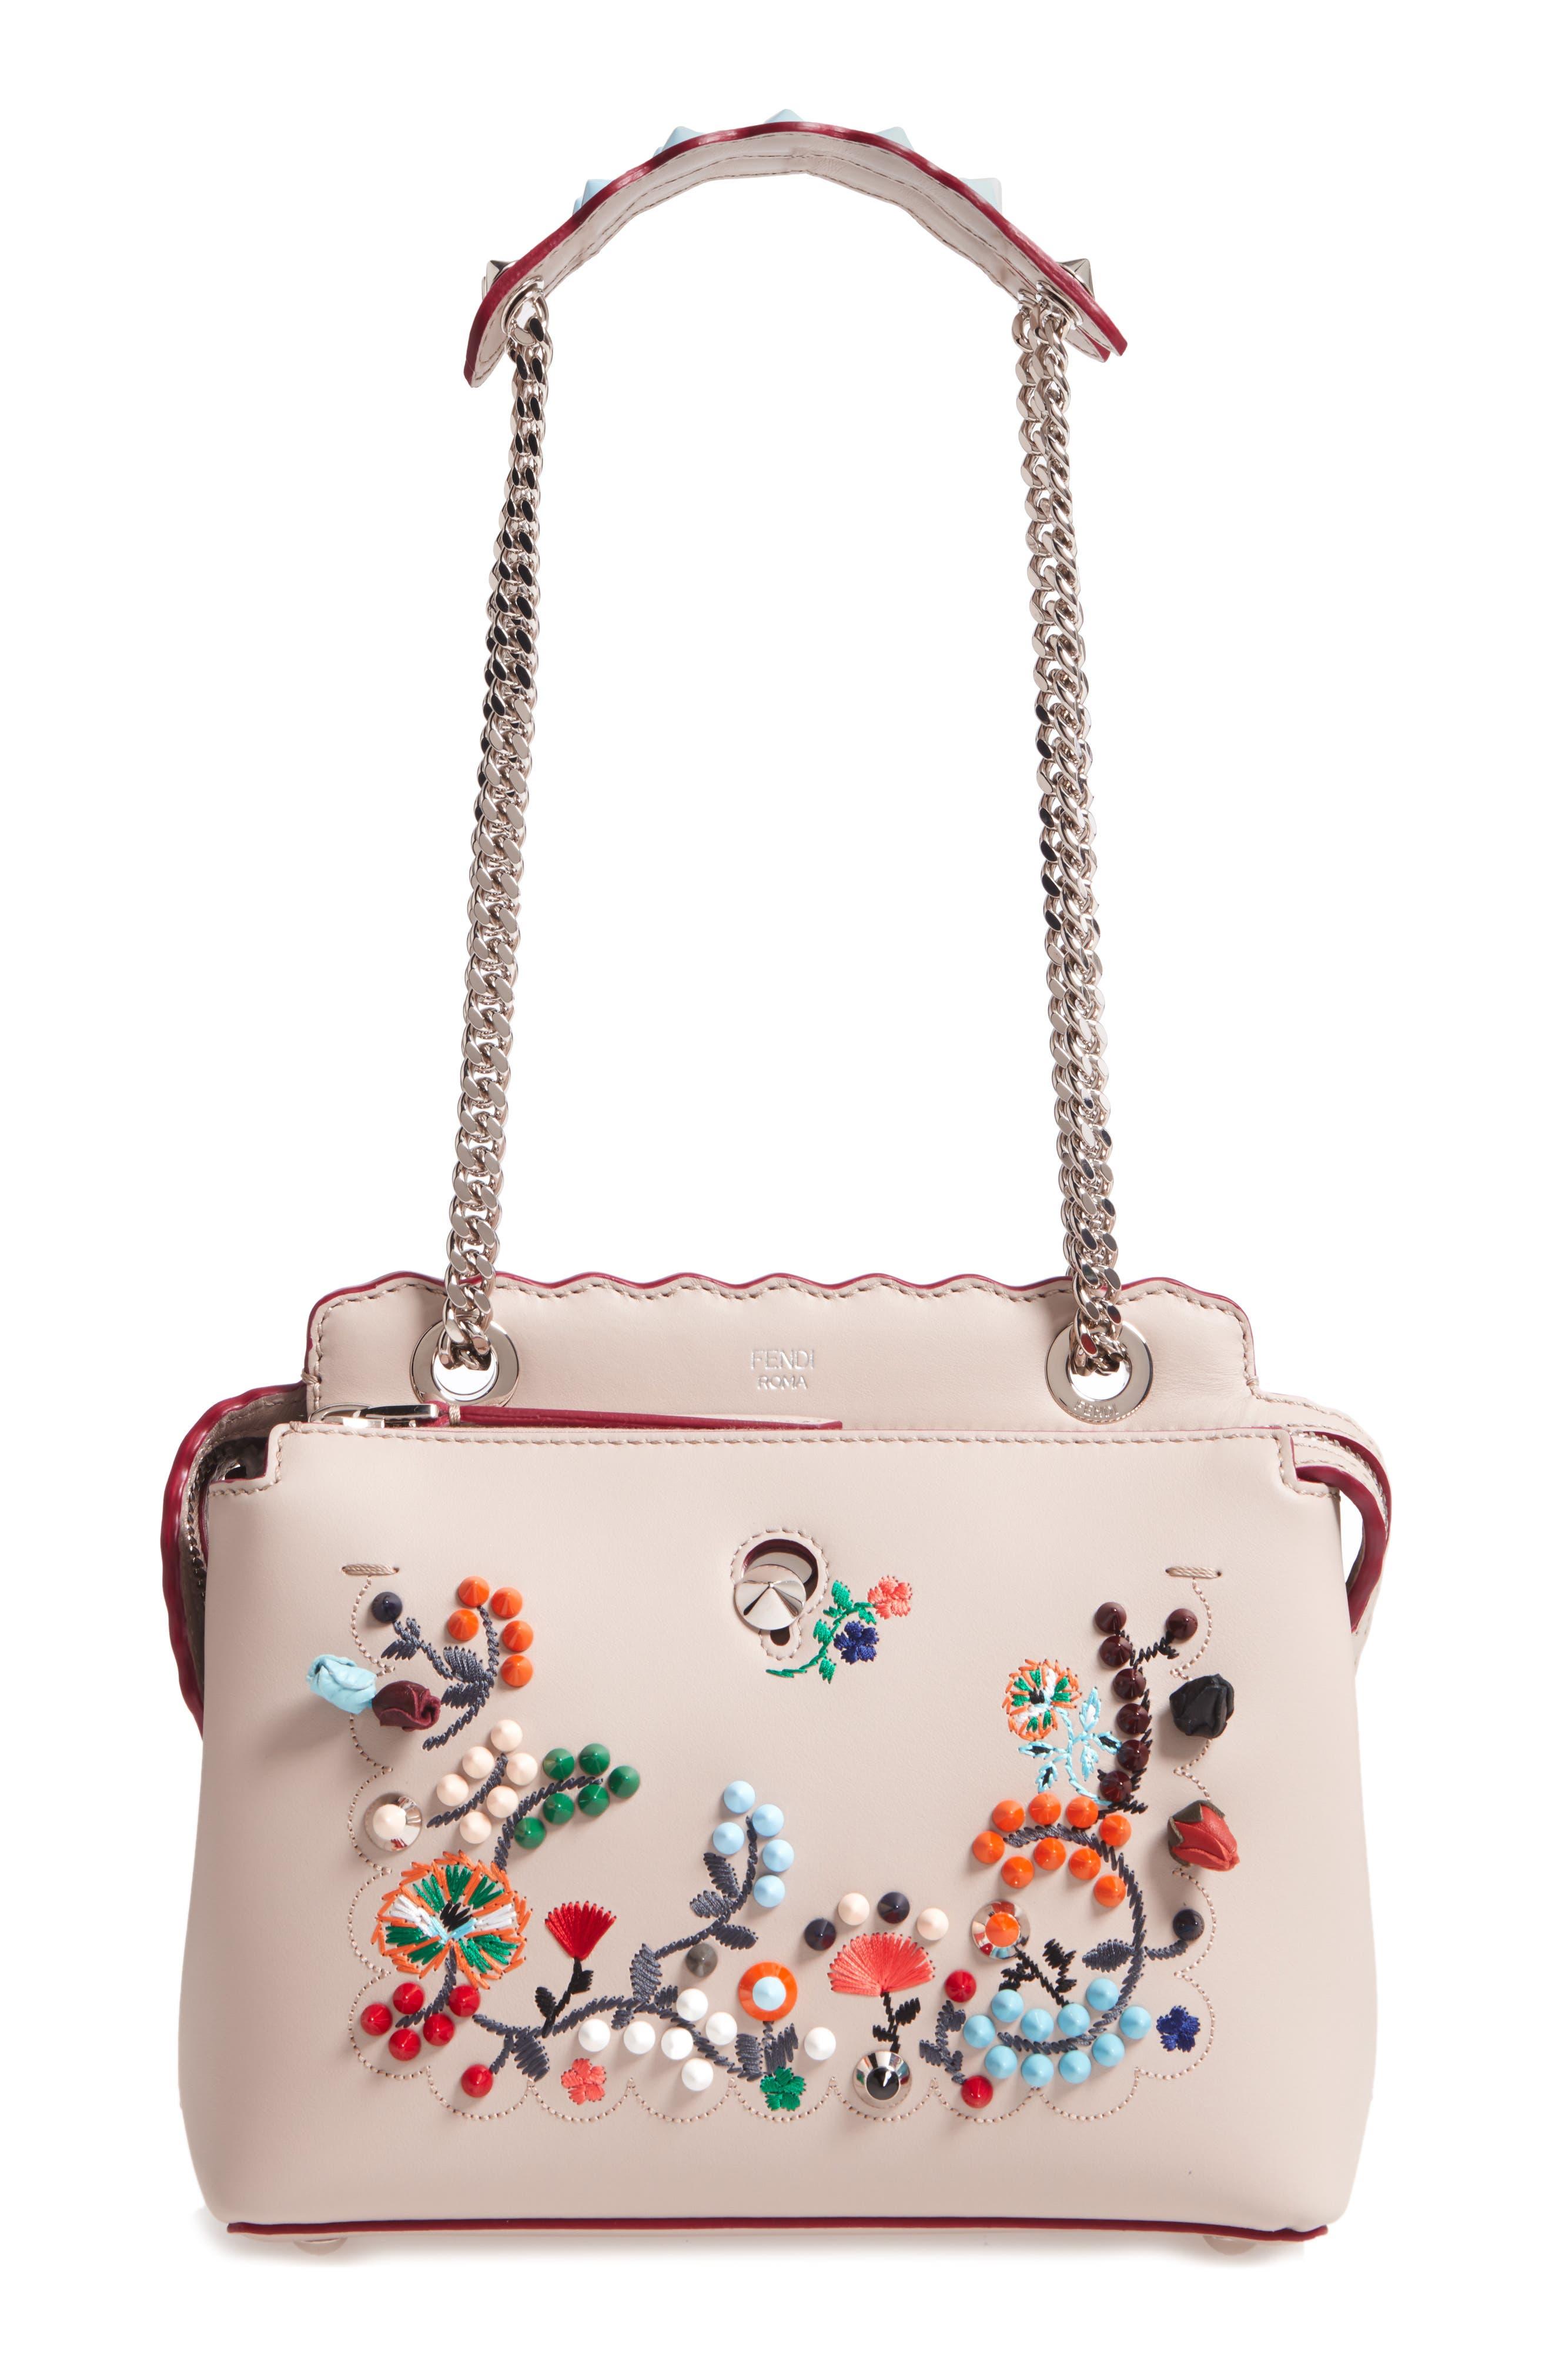 Fendi Small Dotcom Leather Shoulder Bag